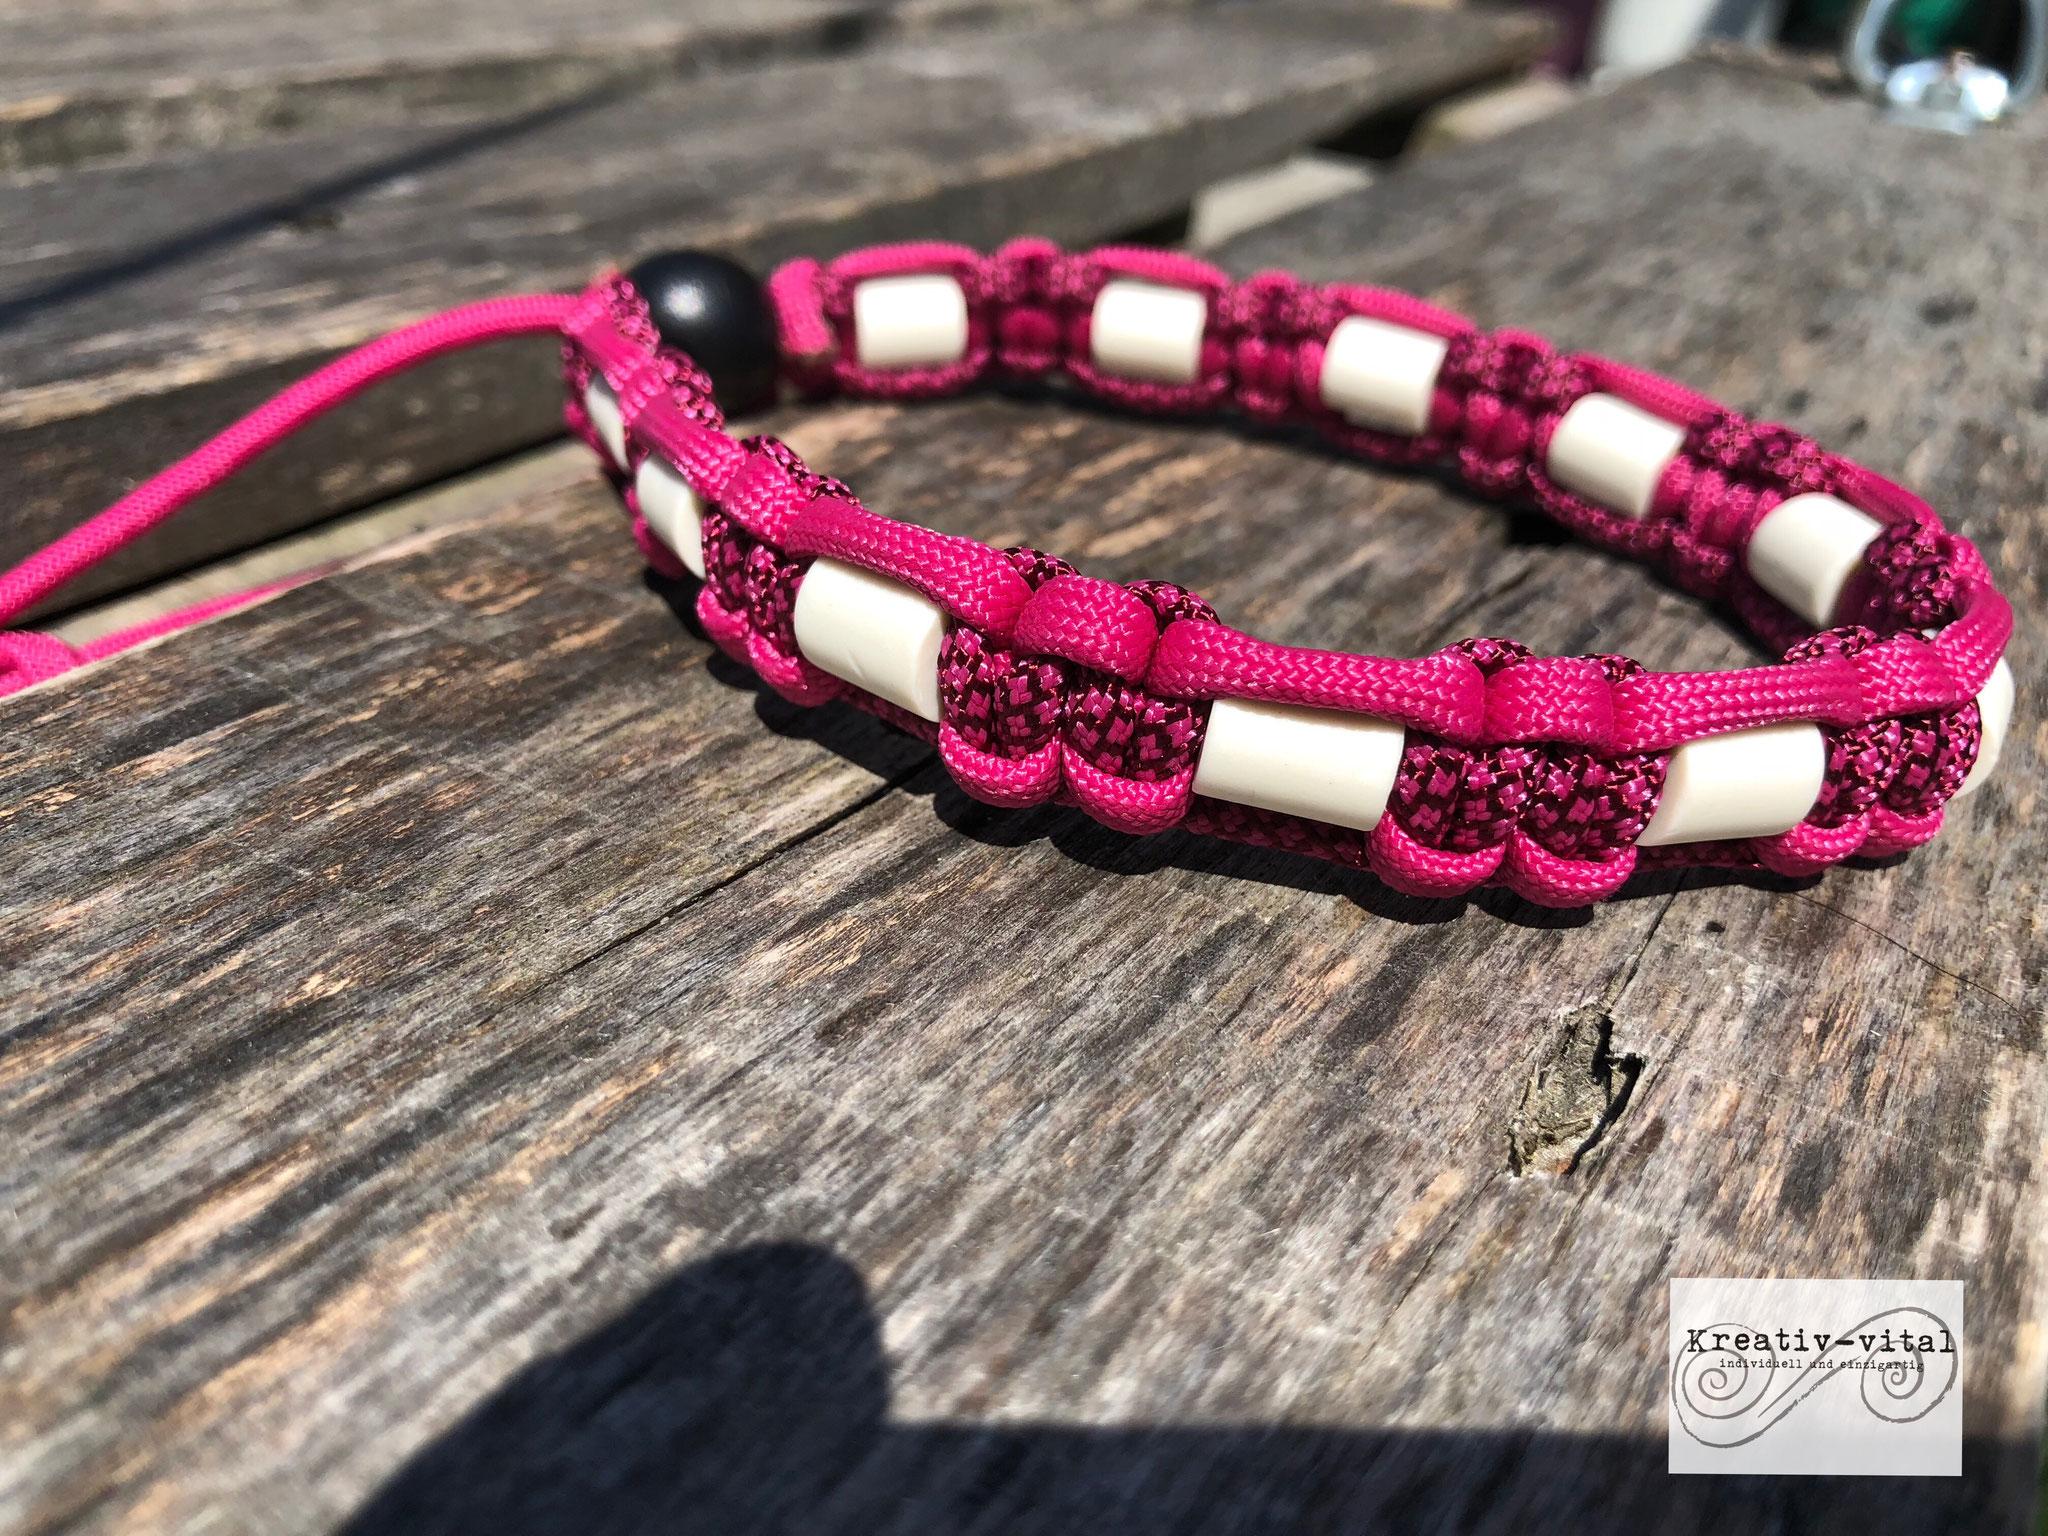 EM Keramik Halsband für Hund/Katze 32-35cm Halsumfang